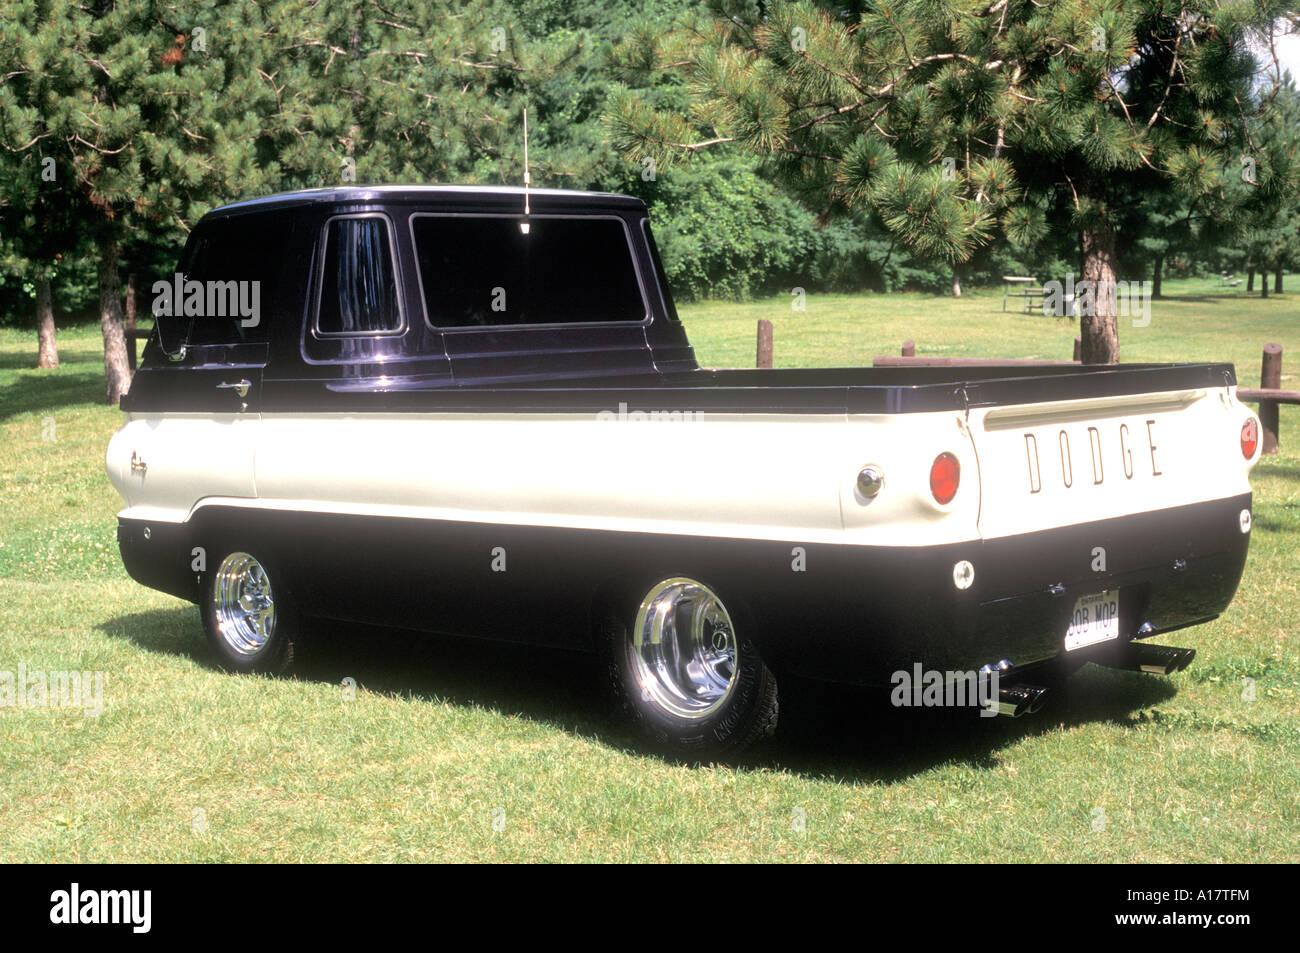 1968 dodge a 100 compact pickup truck stock photo 10172023 alamy 1968 dodge a 100 compact pickup truck publicscrutiny Images